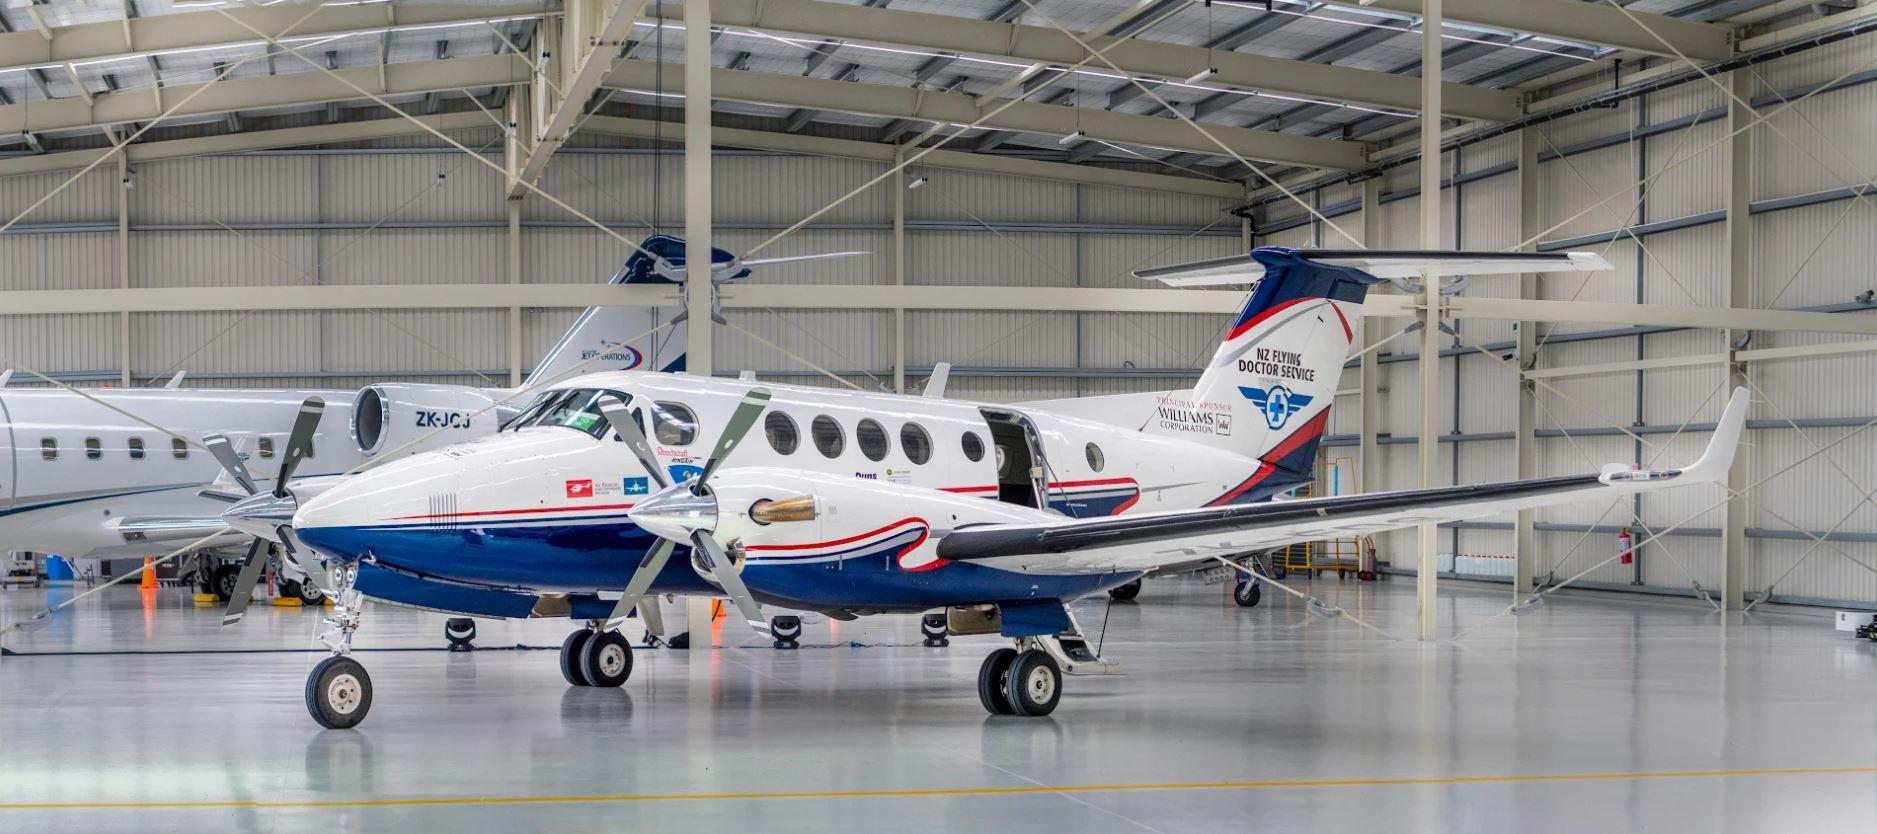 The NZFD plane. Photo: Williams Corporation / NZDF